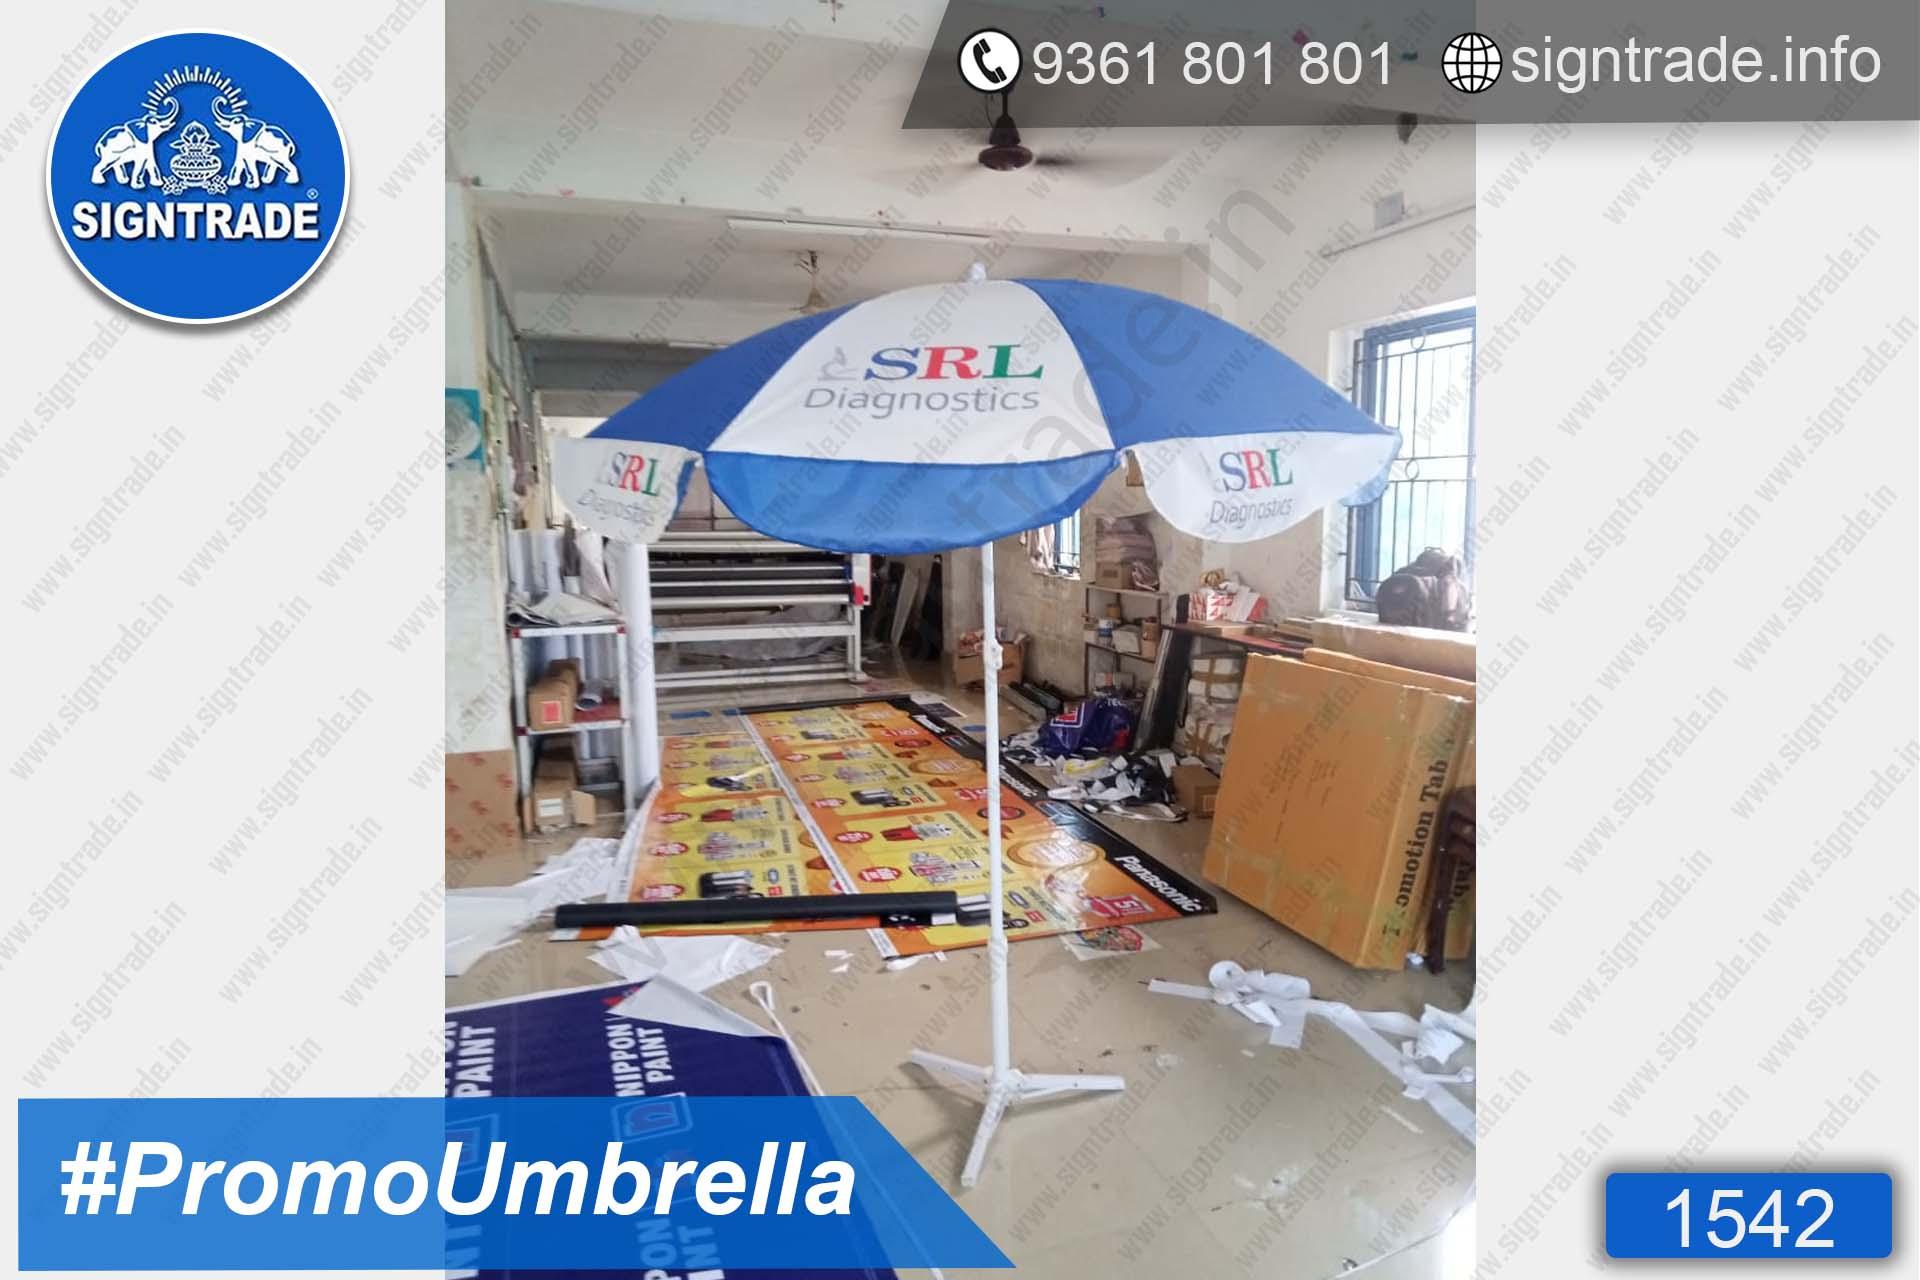 SRL Diagnostics - SIGNTRADE - Promotional Umbrella Manufactures in Chennai